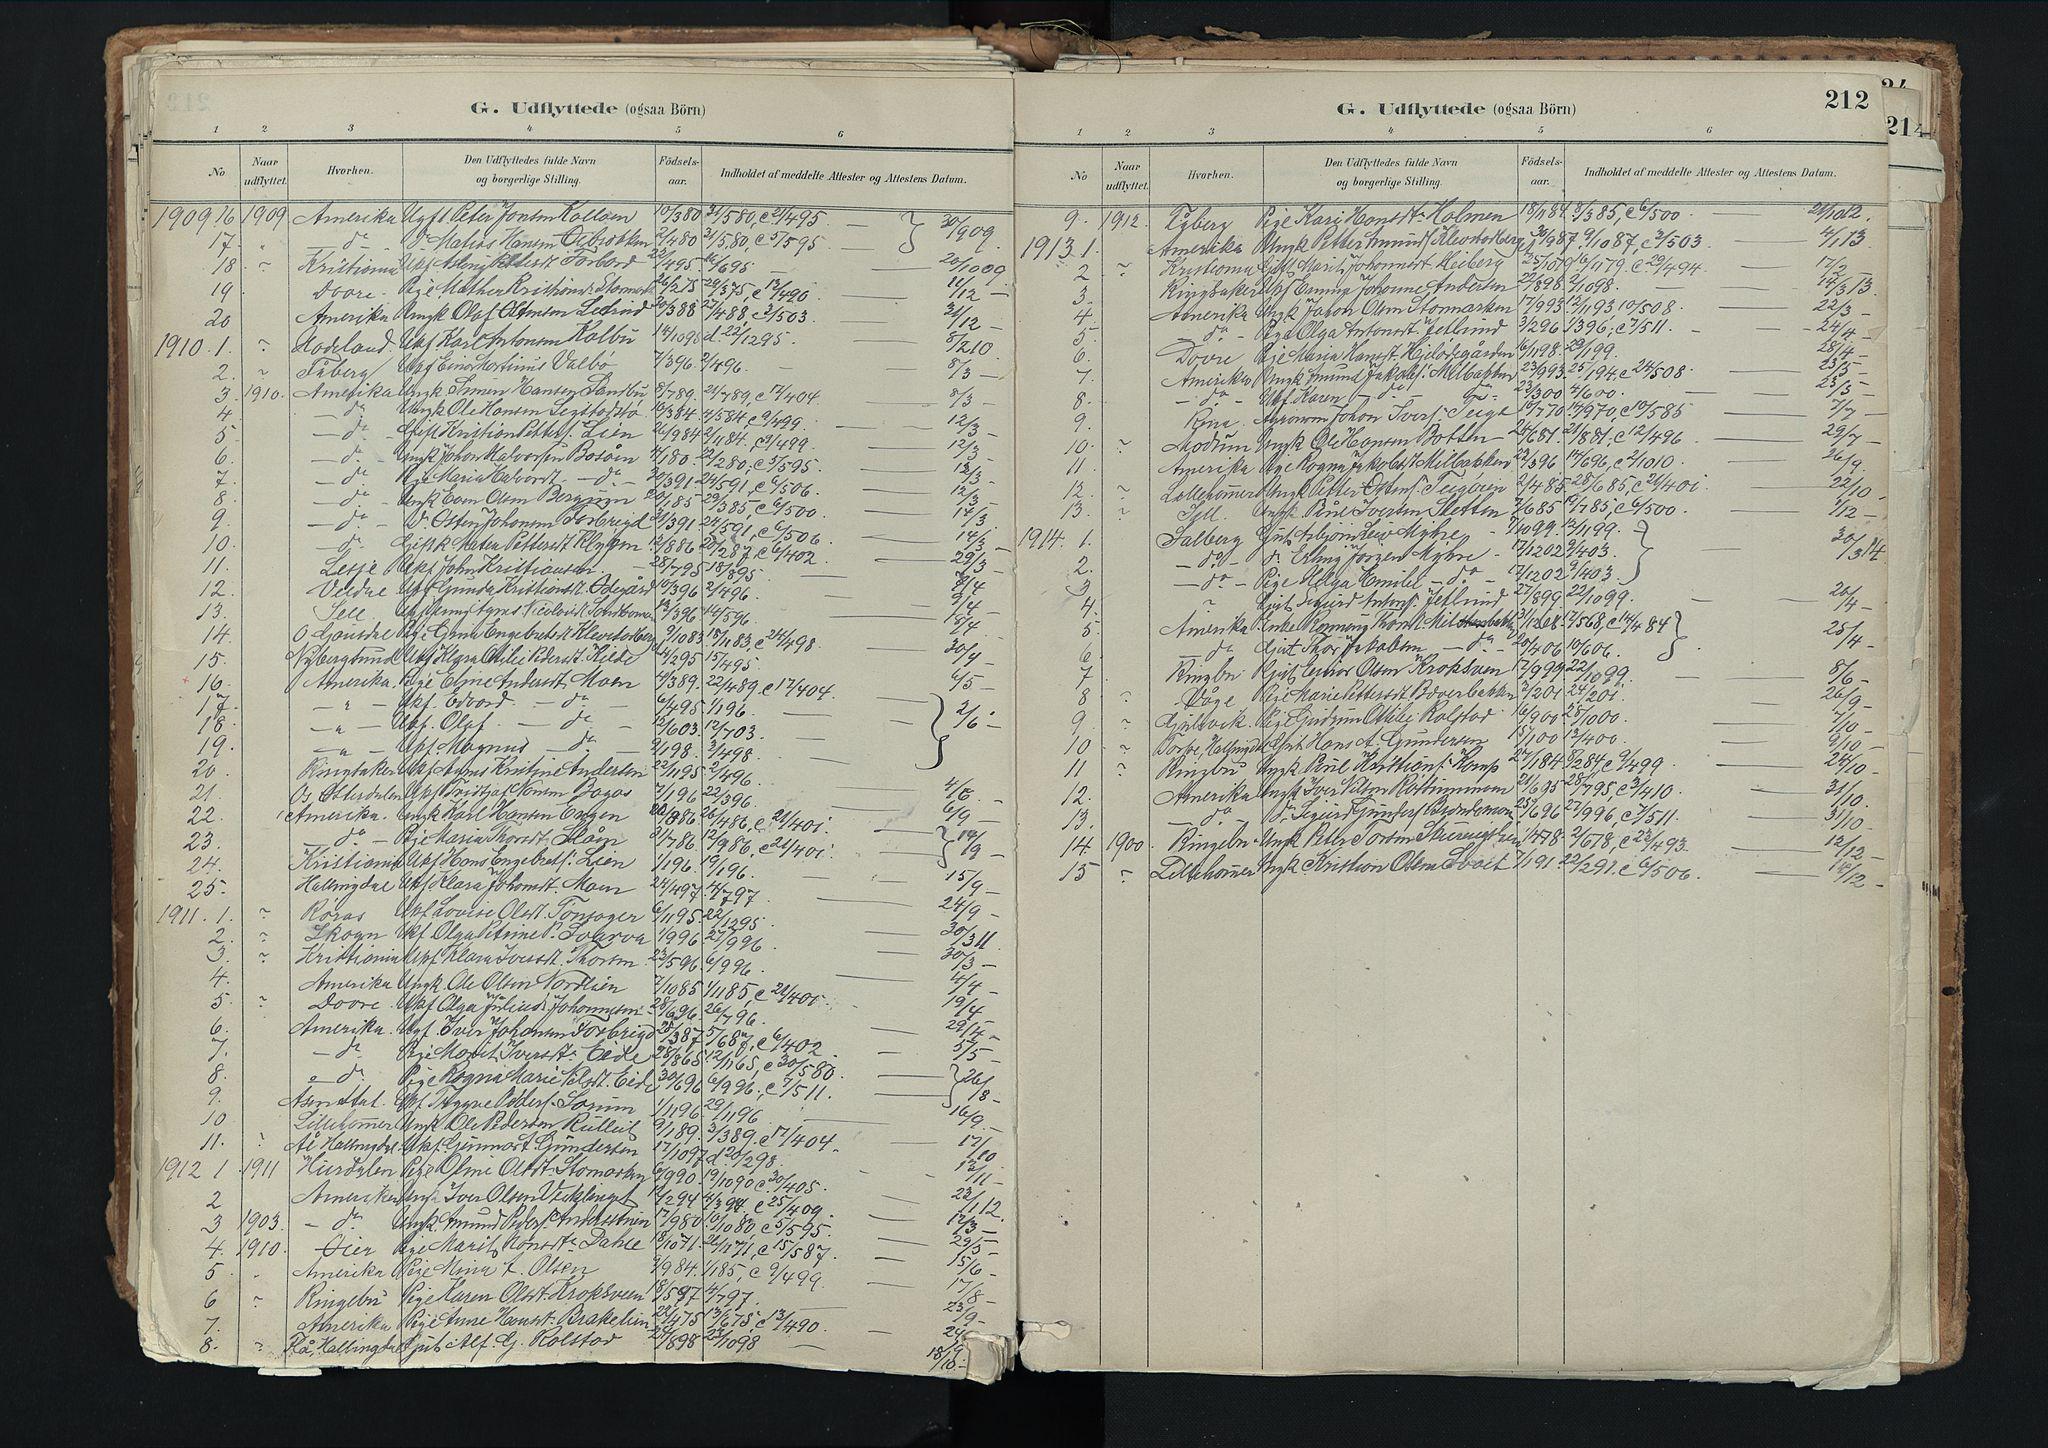 SAH, Nord-Fron prestekontor, Ministerialbok nr. 3, 1884-1914, s. 212